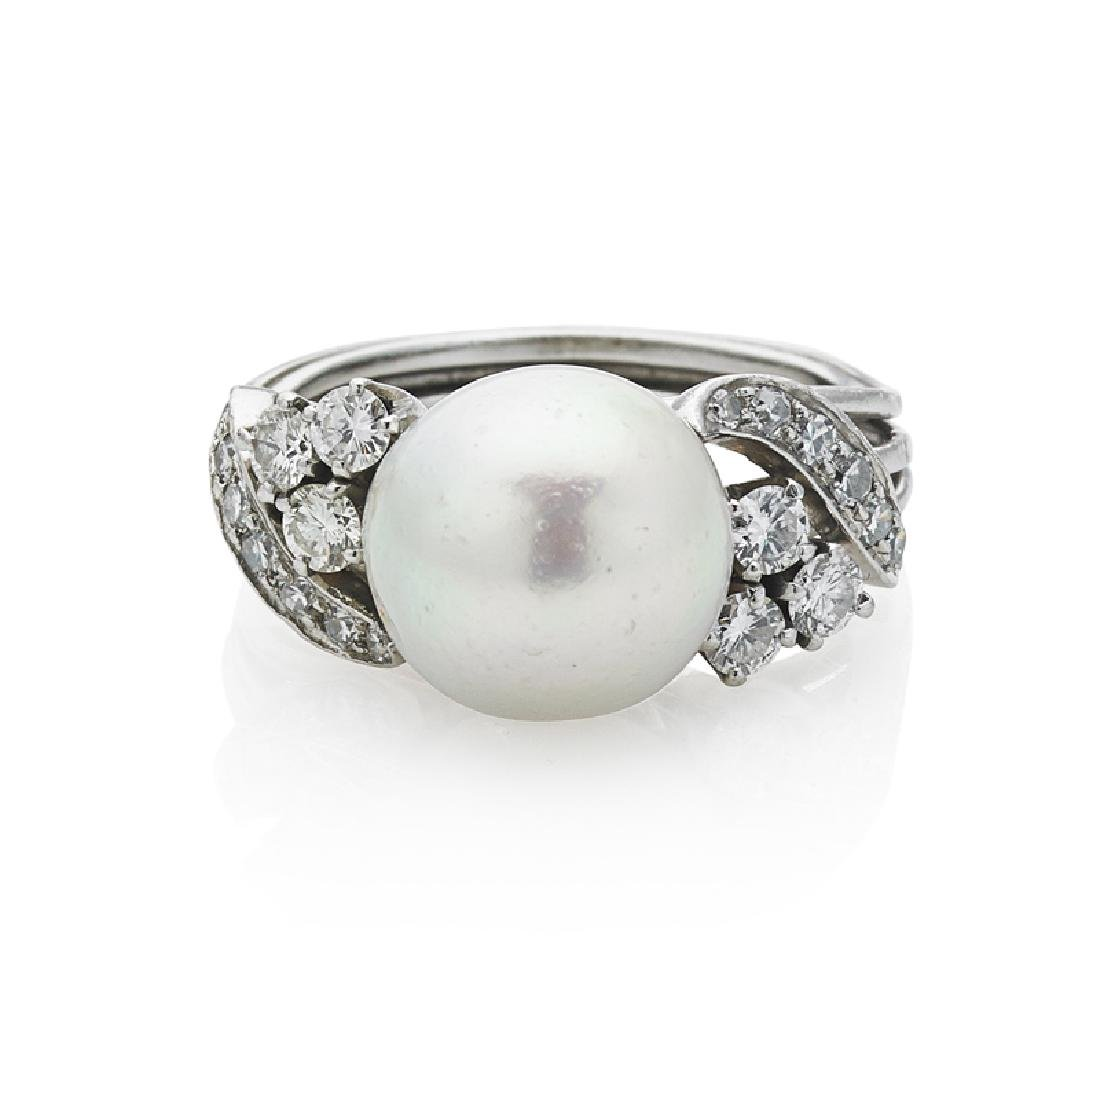 AKOYA PEARL, DIAMOND & PLATINUM RING